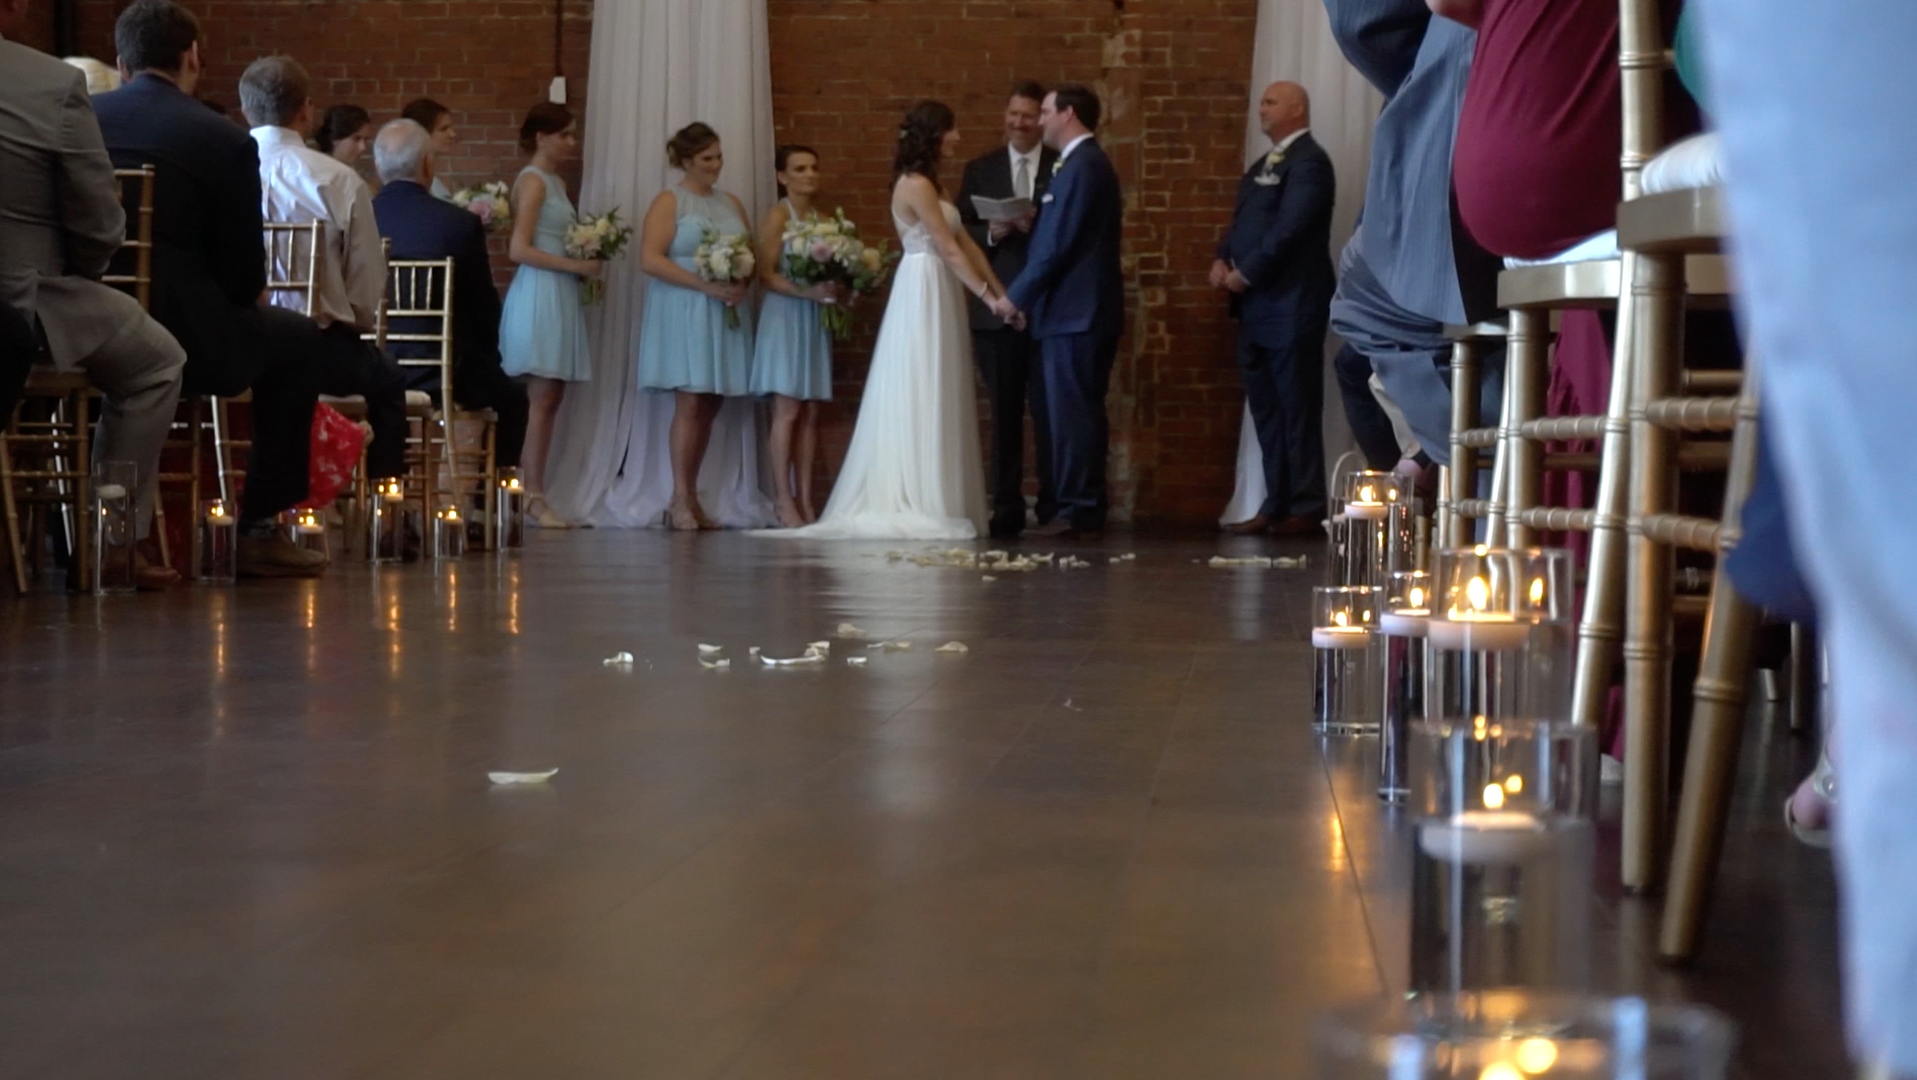 Ajesla and Zachary's Wedding